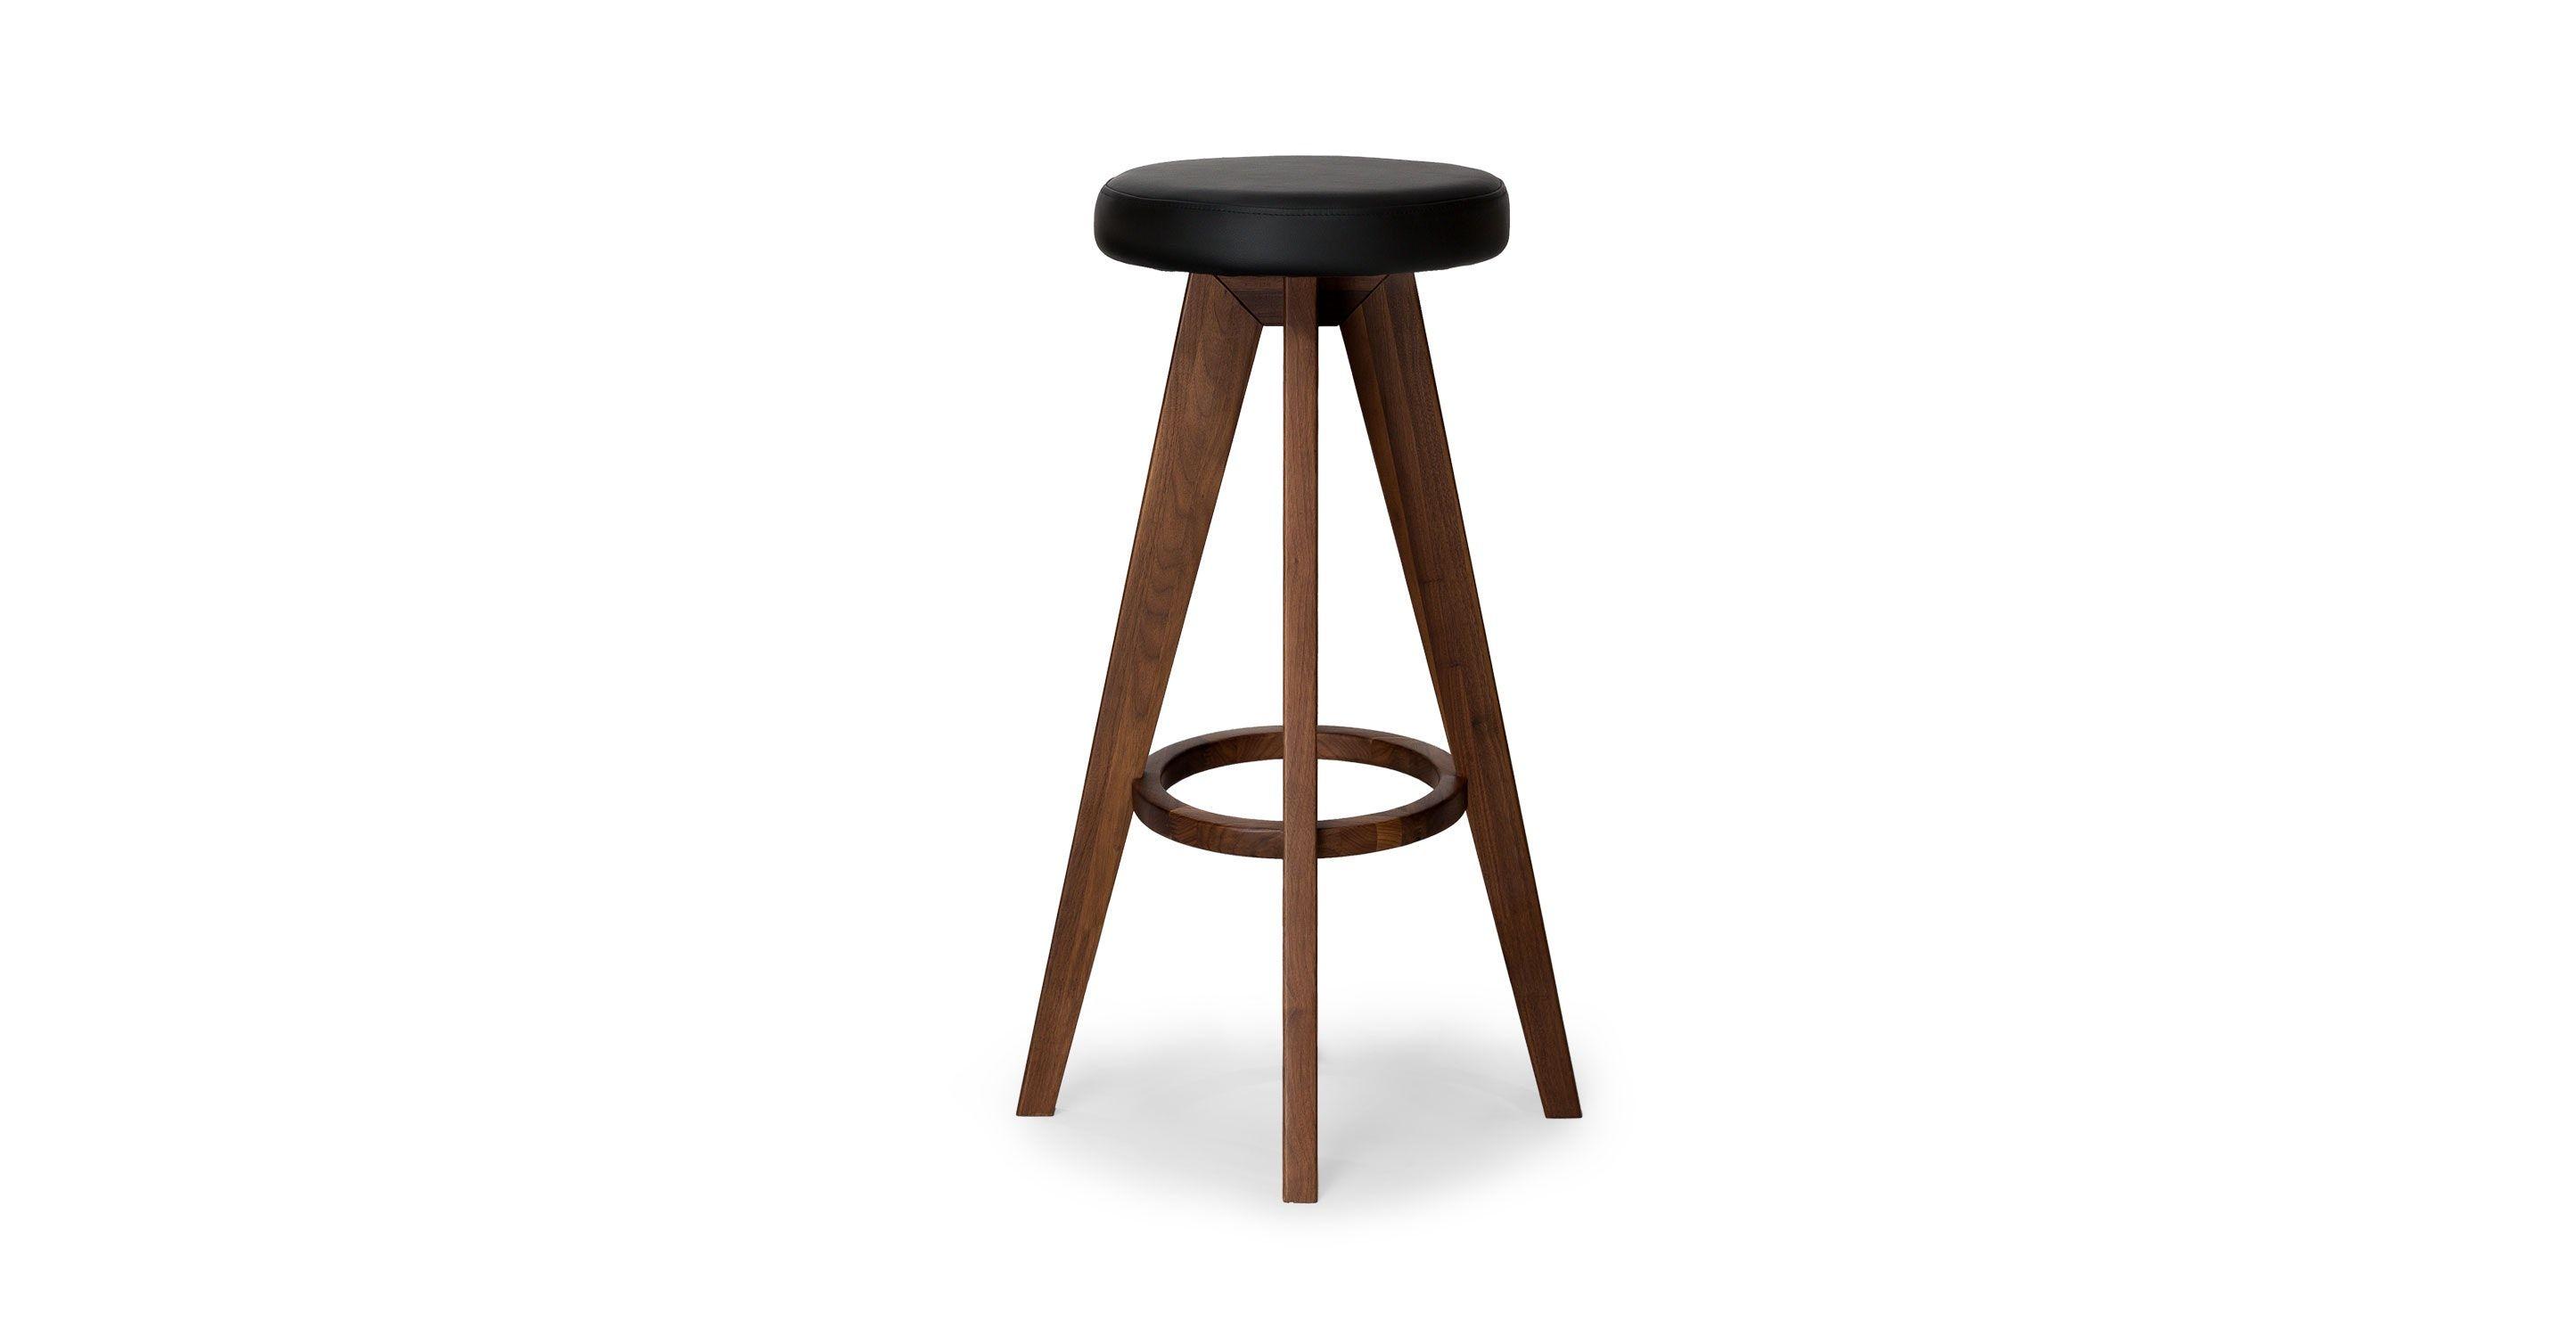 Superb Circo Black Leather Walnut Bar Stool Stools Bar Stools Short Links Chair Design For Home Short Linksinfo